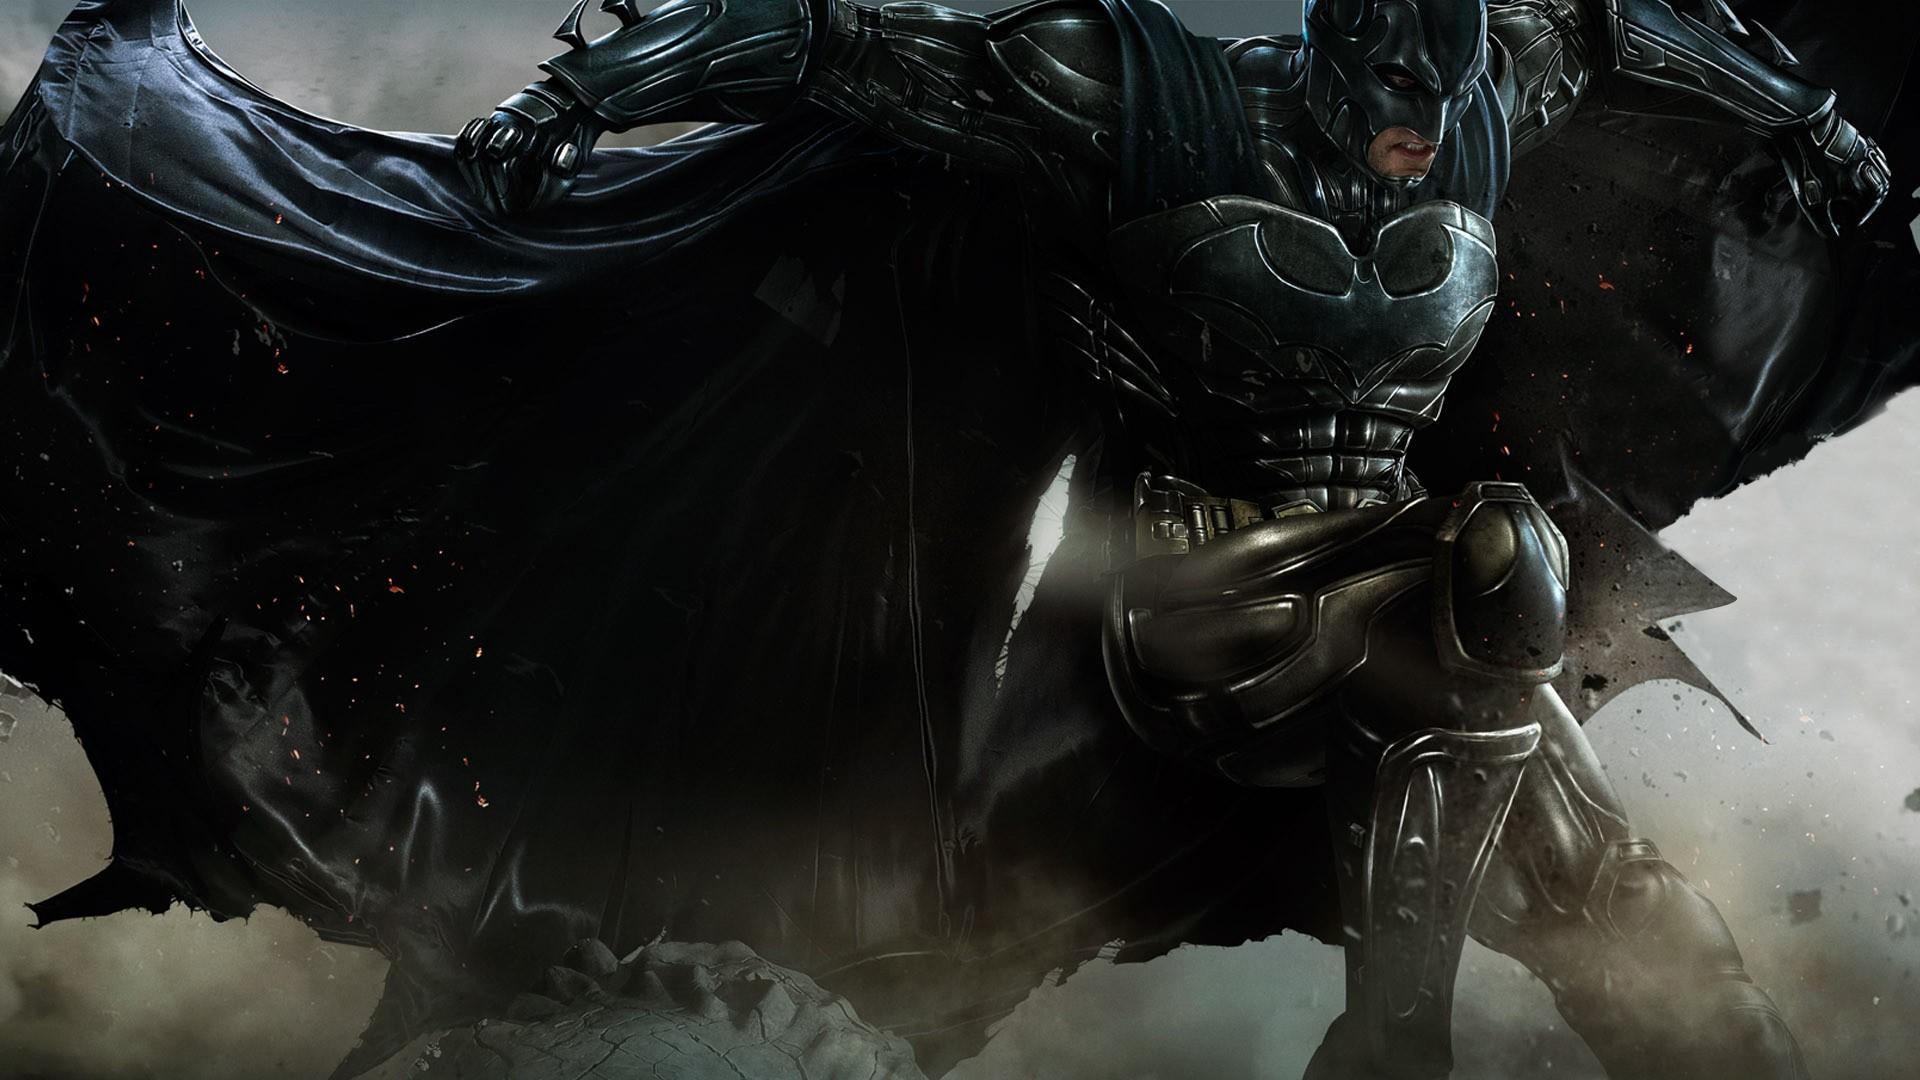 Video Games Batman Injustice Gods Among Us Darkness Screenshot Computer Wallpaper Fictional Character